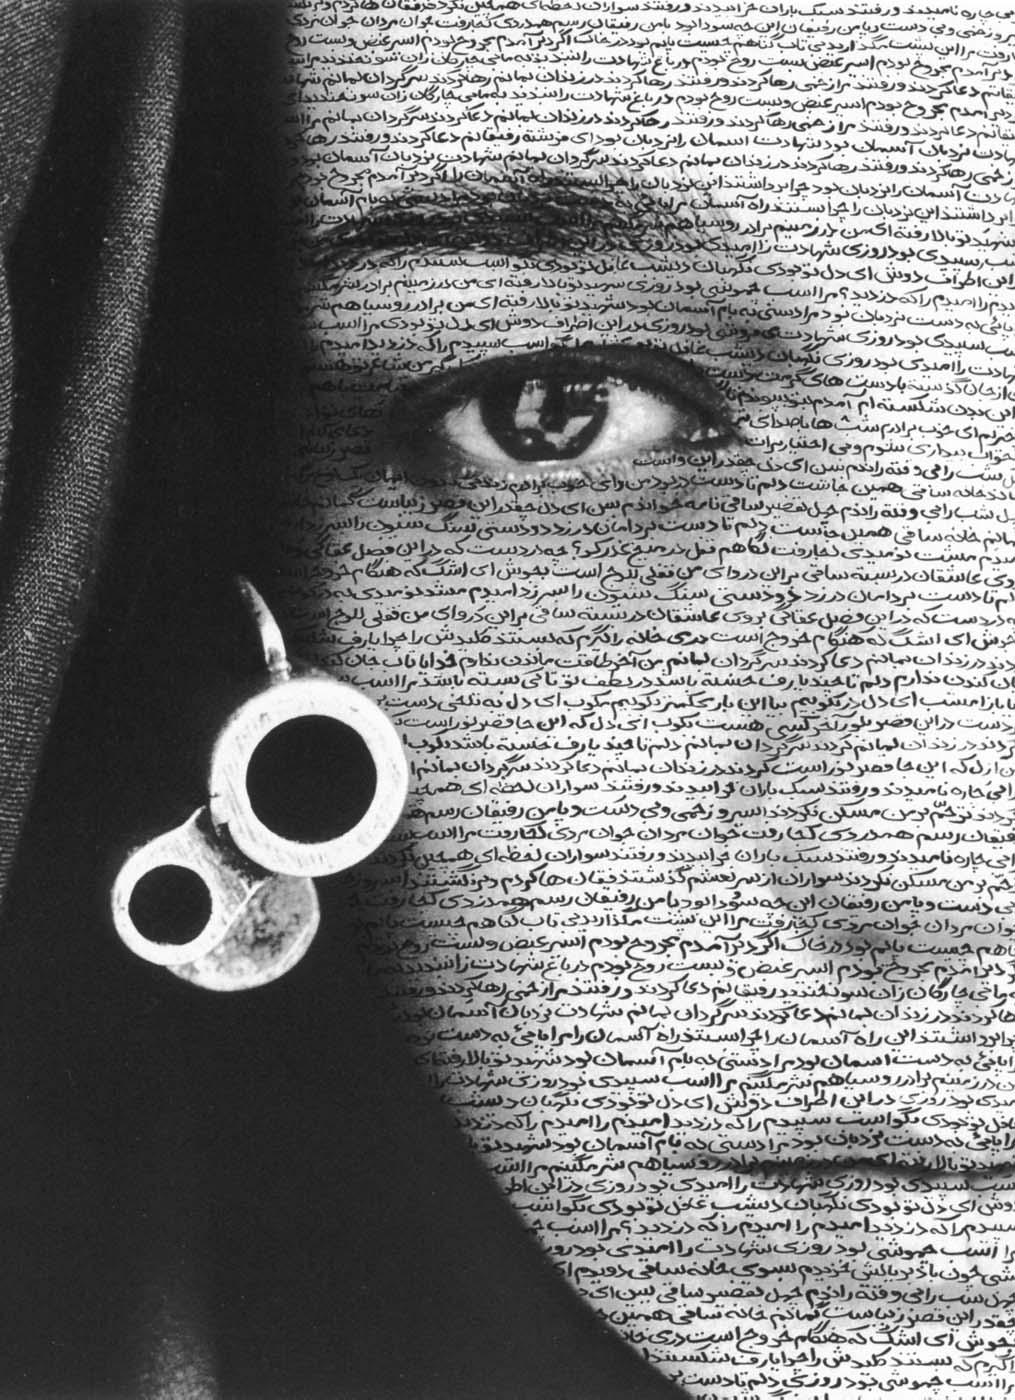 New Girl Wallpaper 2013 Shirin Neshat Helen Twin Artwork